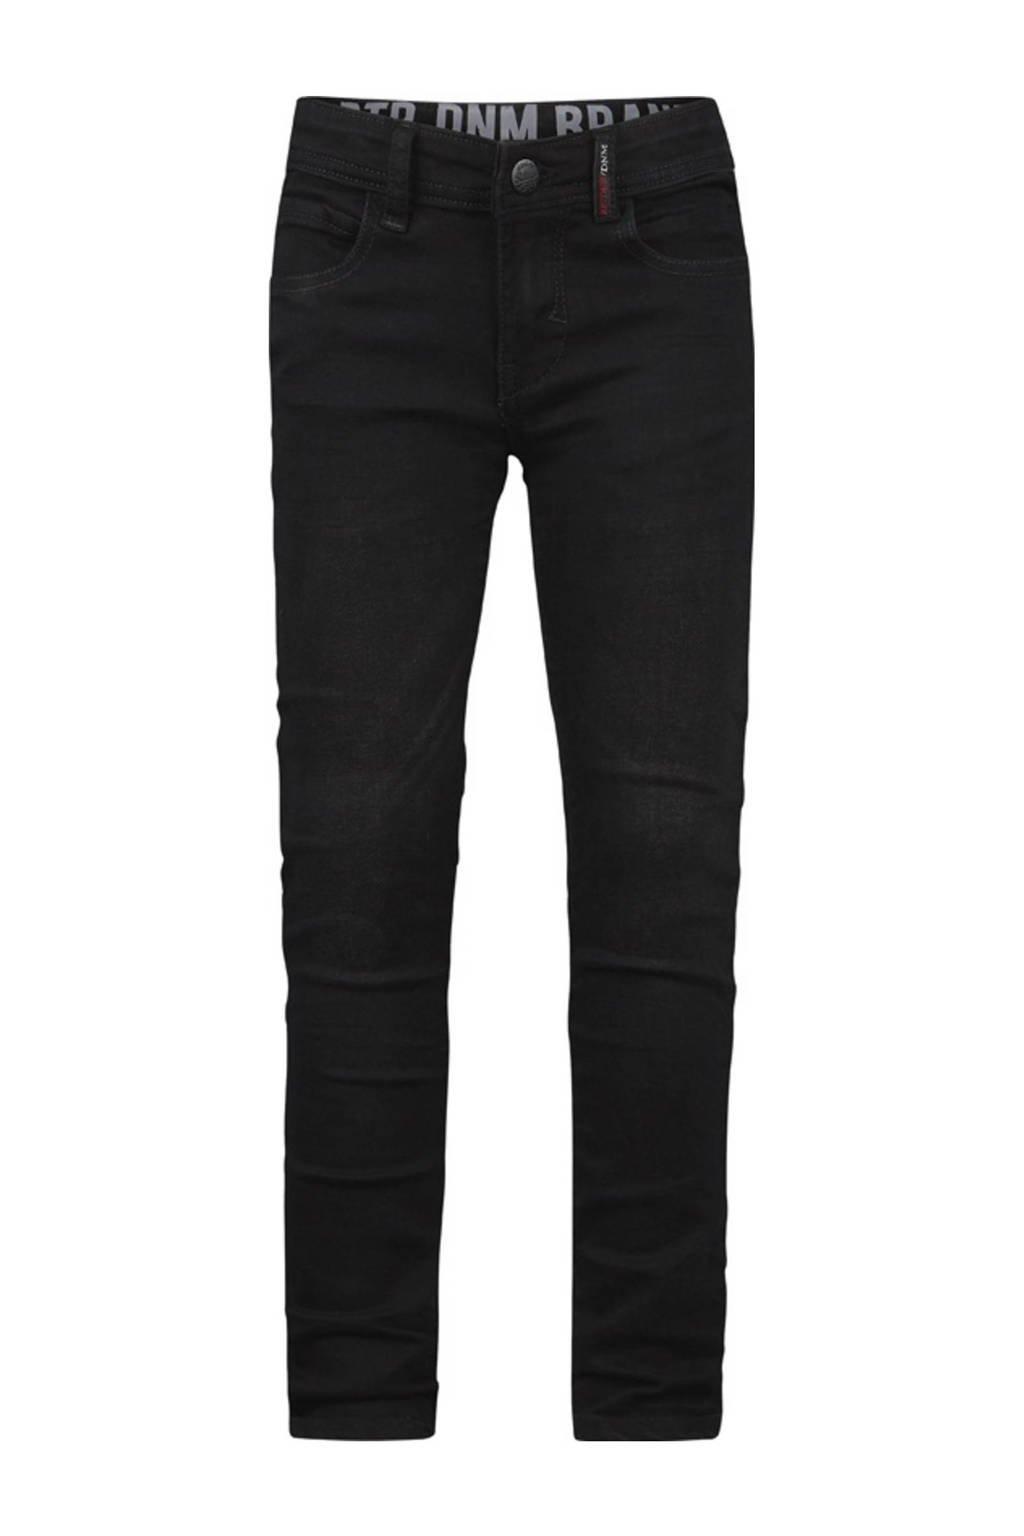 Retour Denim slim fit jeans Tobias black denim, Black denim